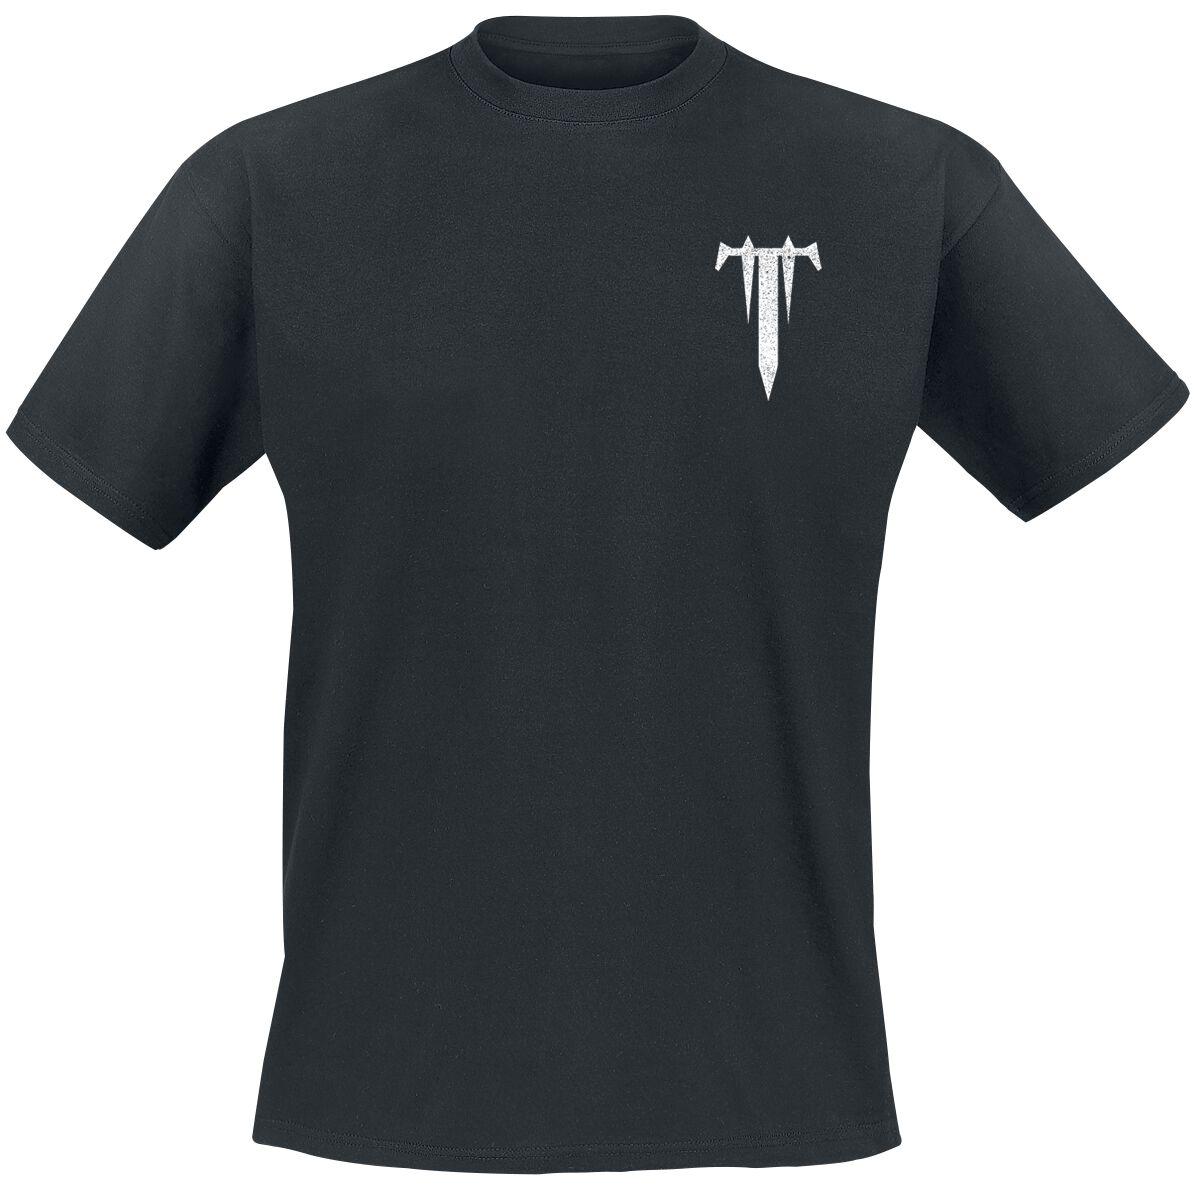 Zespoły - Koszulki - T-Shirt Trivium Biker T-Shirt czarny - 356160